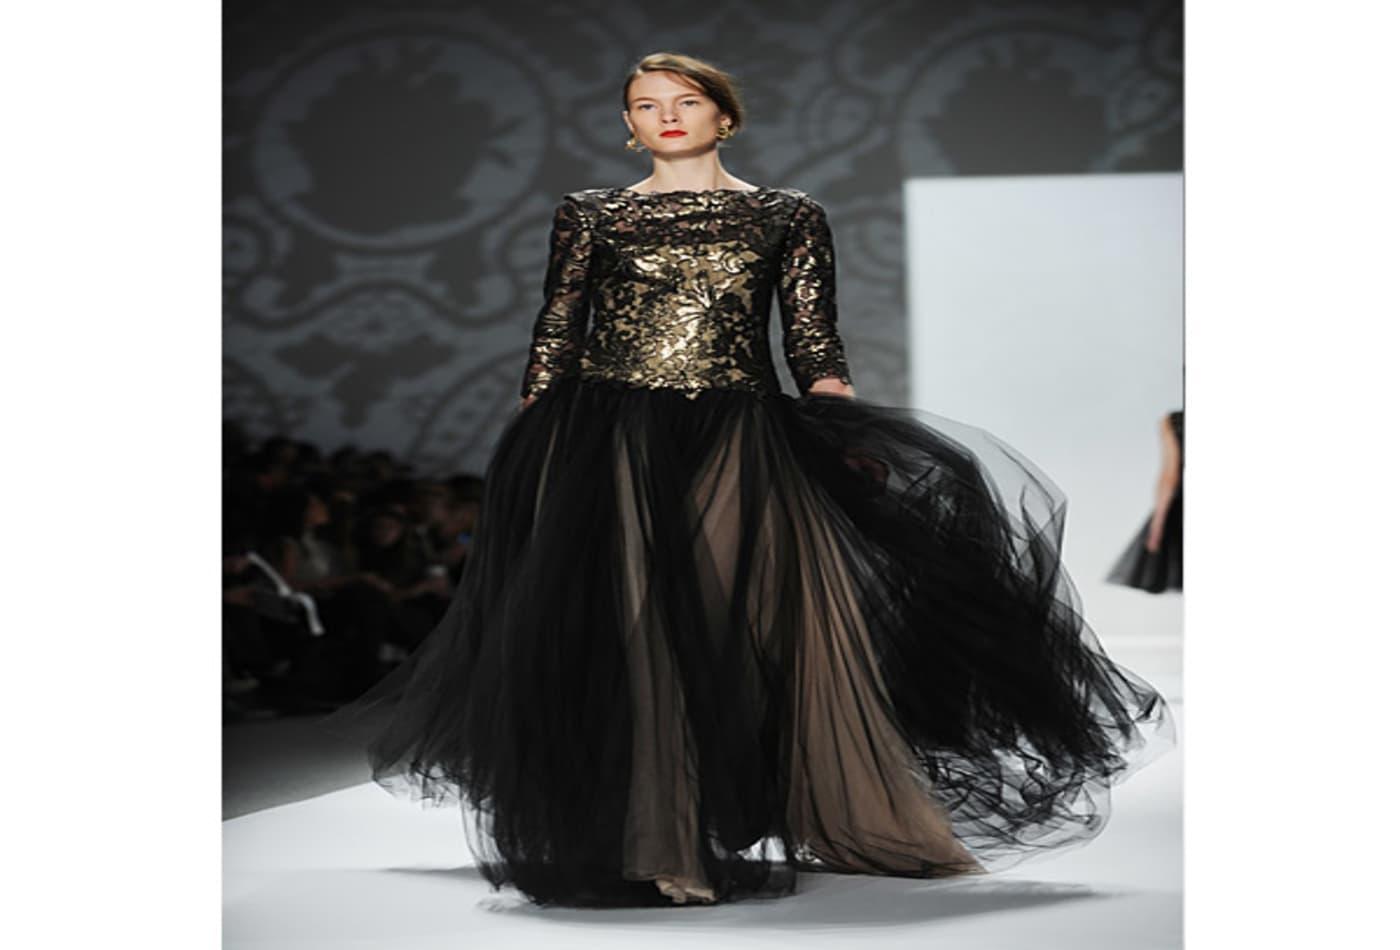 fall-fashion-week-2012-tadashi-shoji-001.jpg